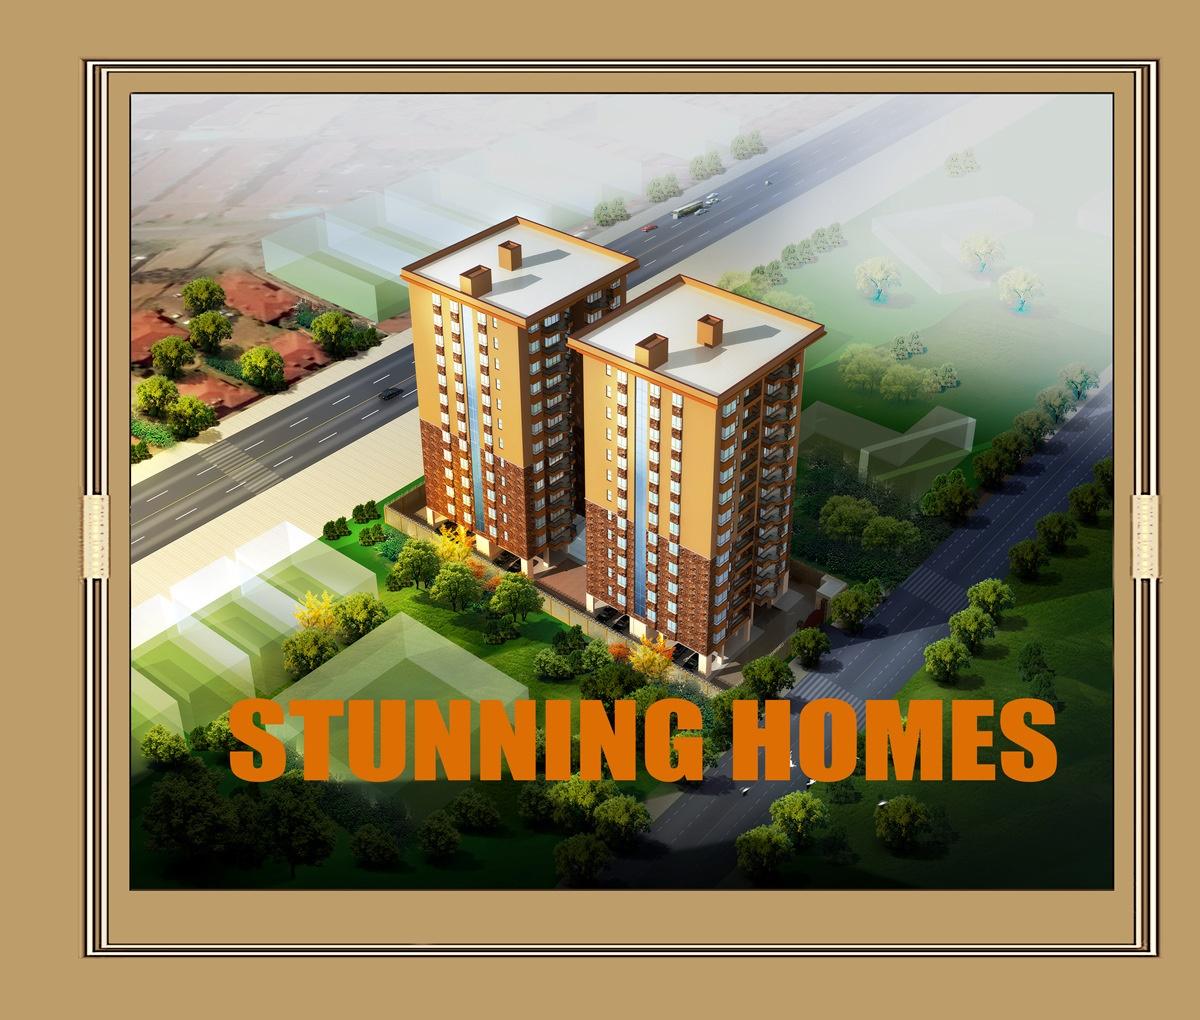 STUNNING HOMES KILIMANI-LENANA ROAD. 2 & 3 BEDROOM